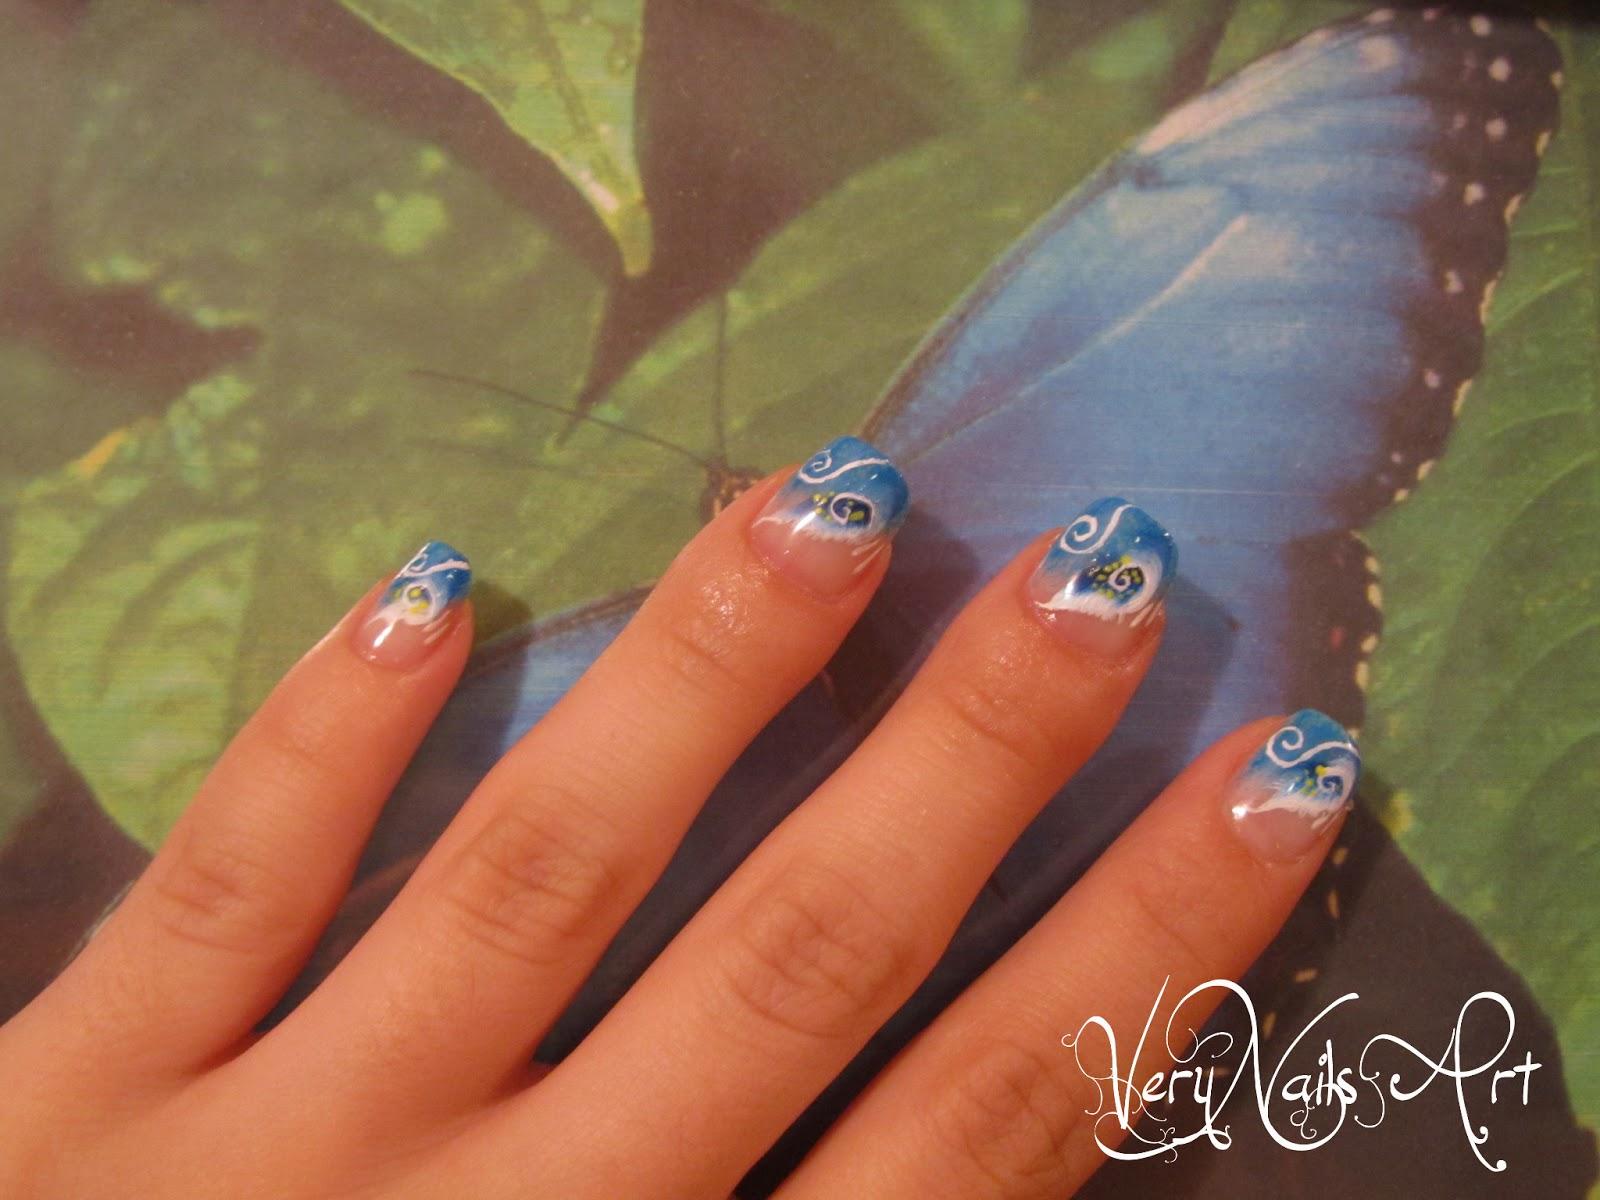 Uñas decoradas con flores azules